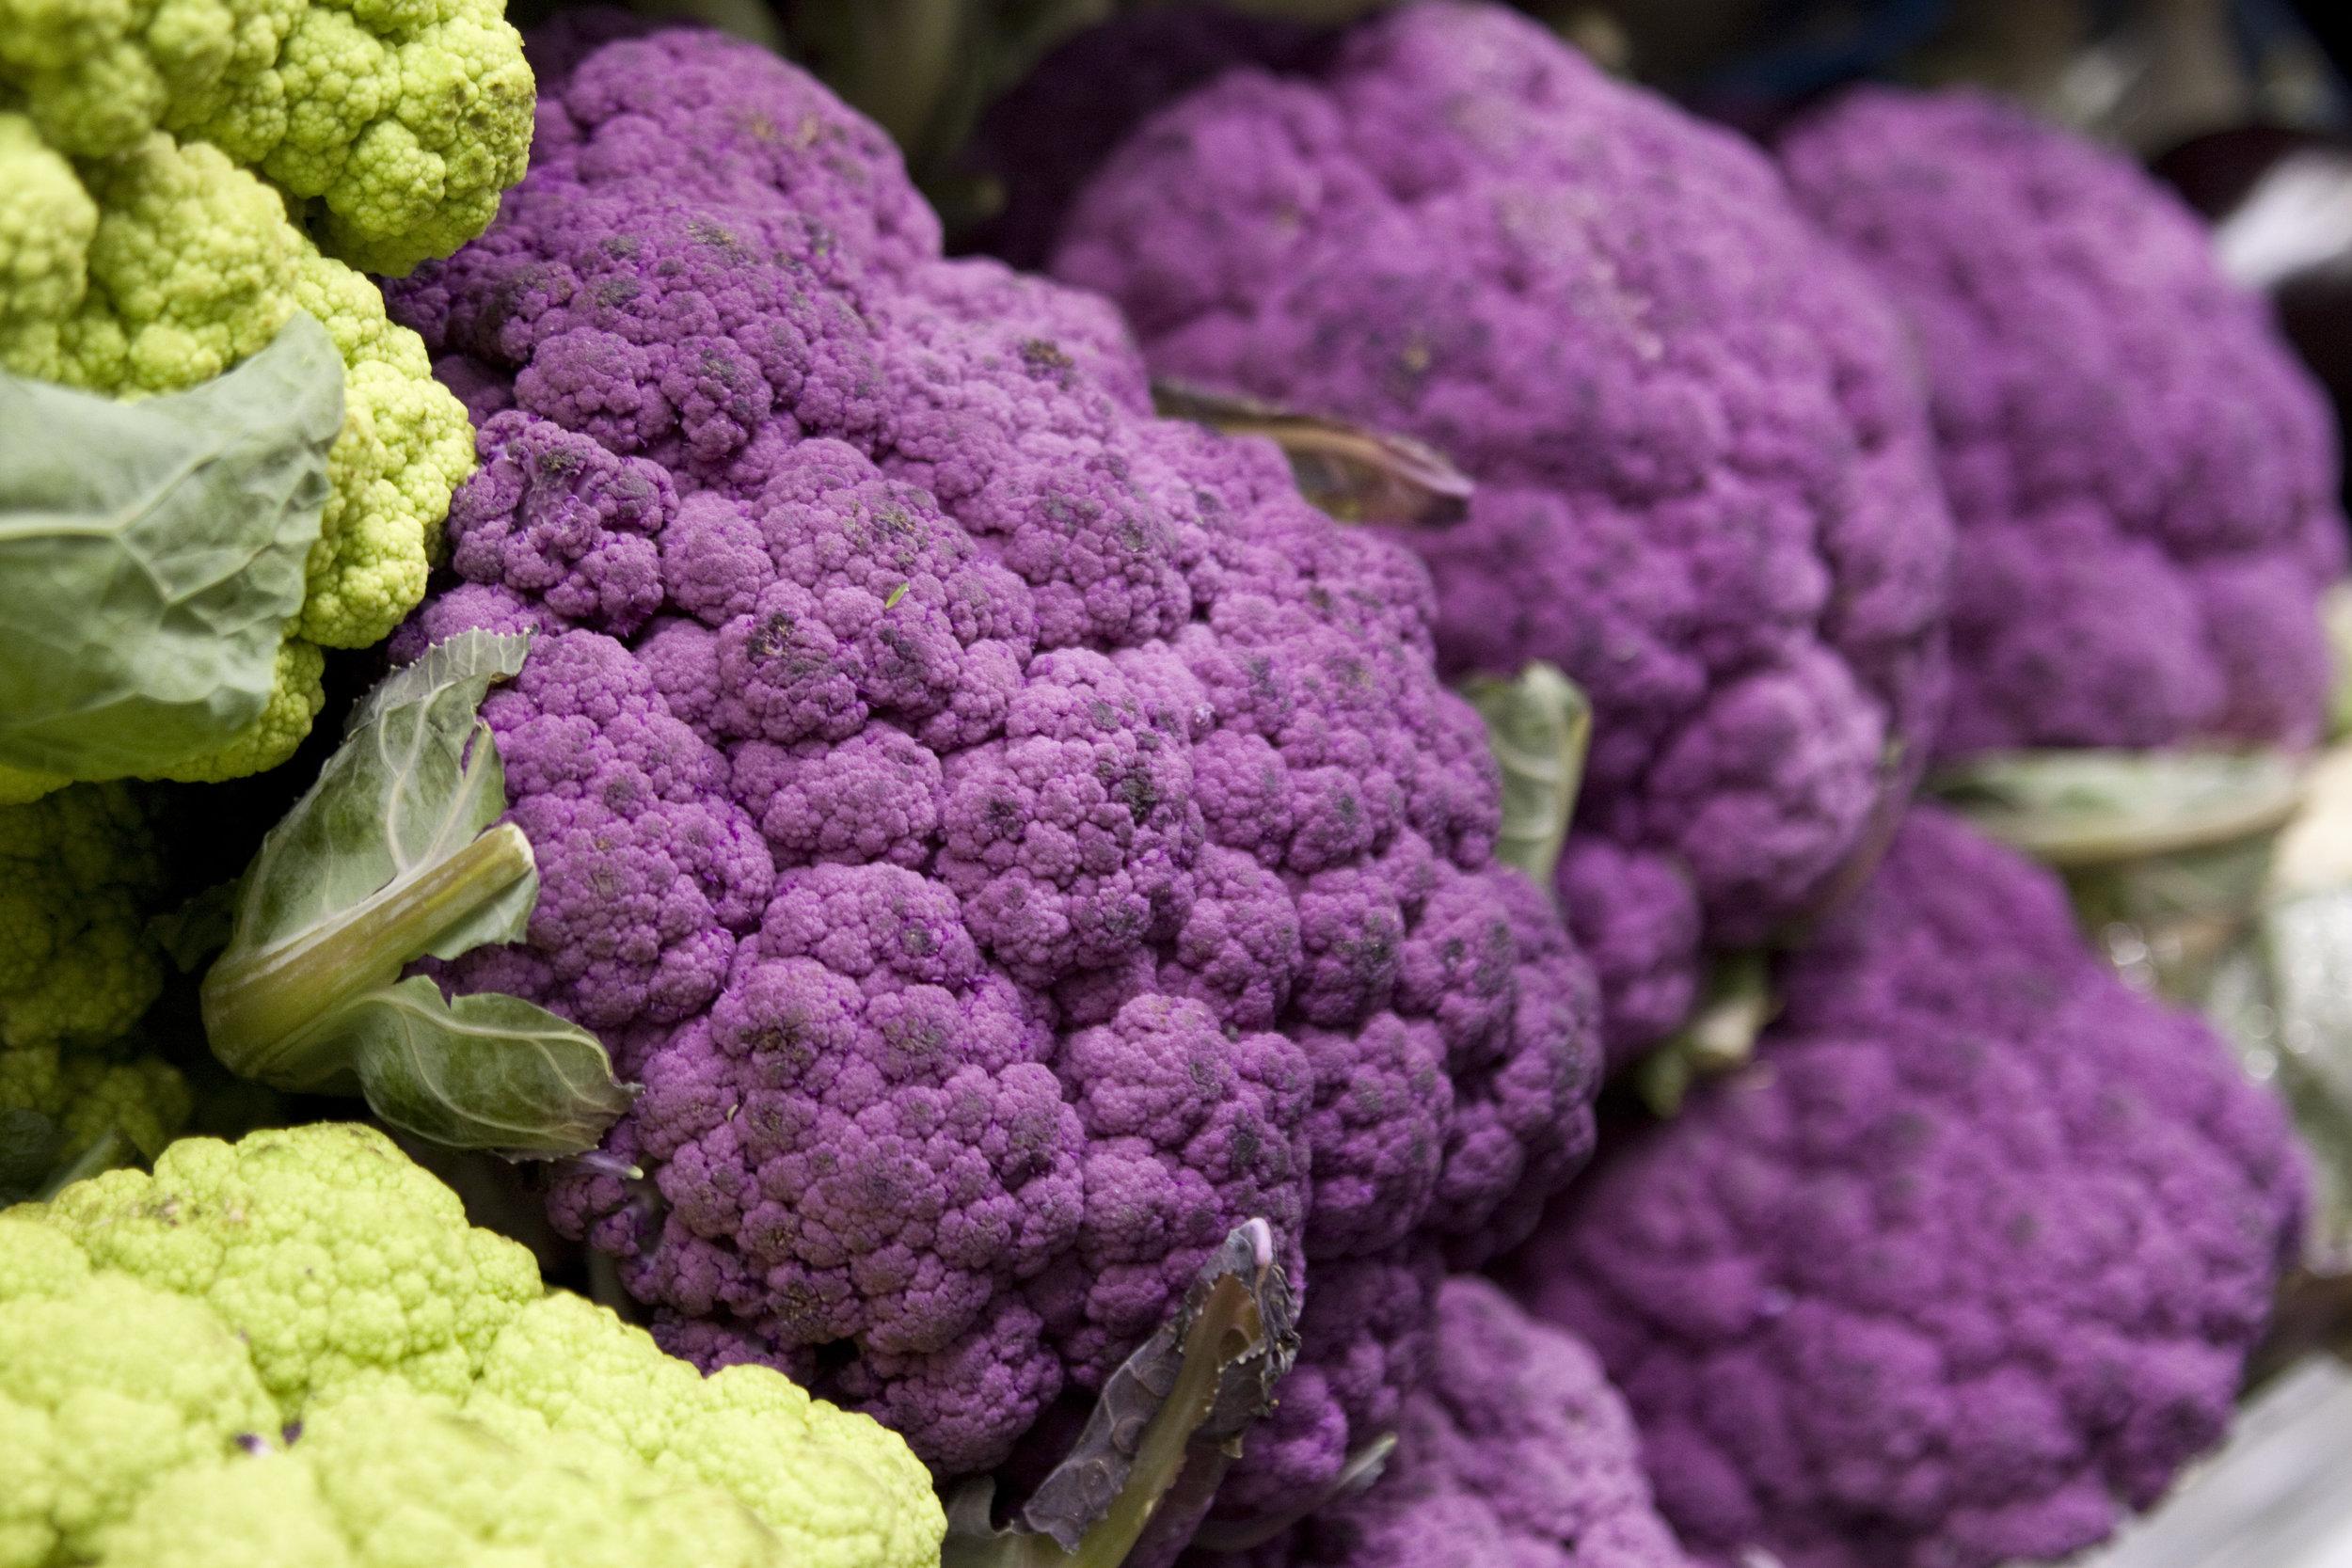 organic-fresh-cauliflower-mana-foods-produce copy.jpg